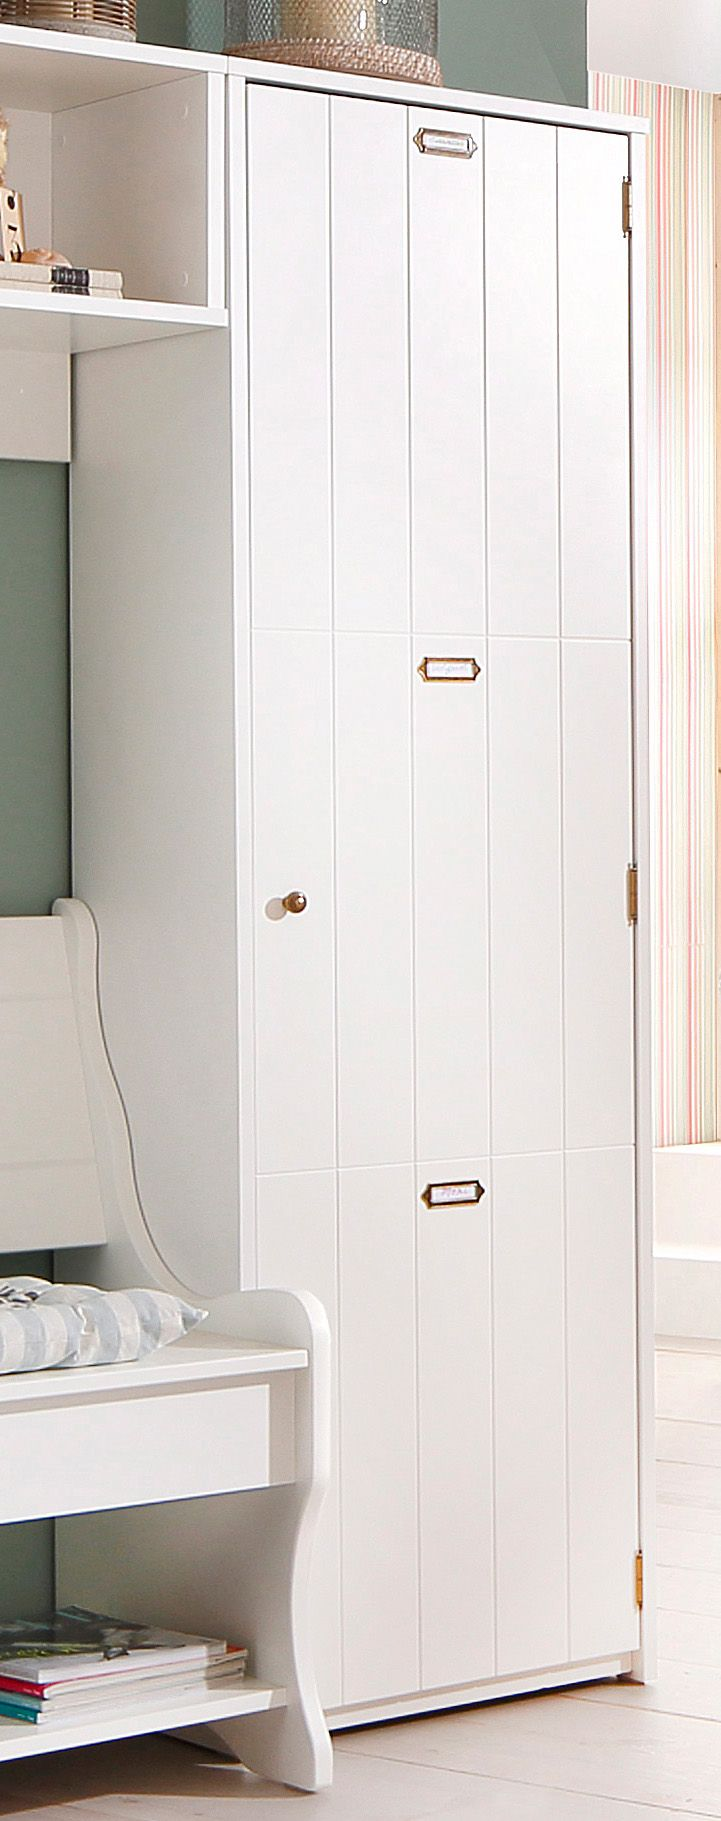 schuhschrank home affaire arden schwab versand schuhschr nke kipper. Black Bedroom Furniture Sets. Home Design Ideas